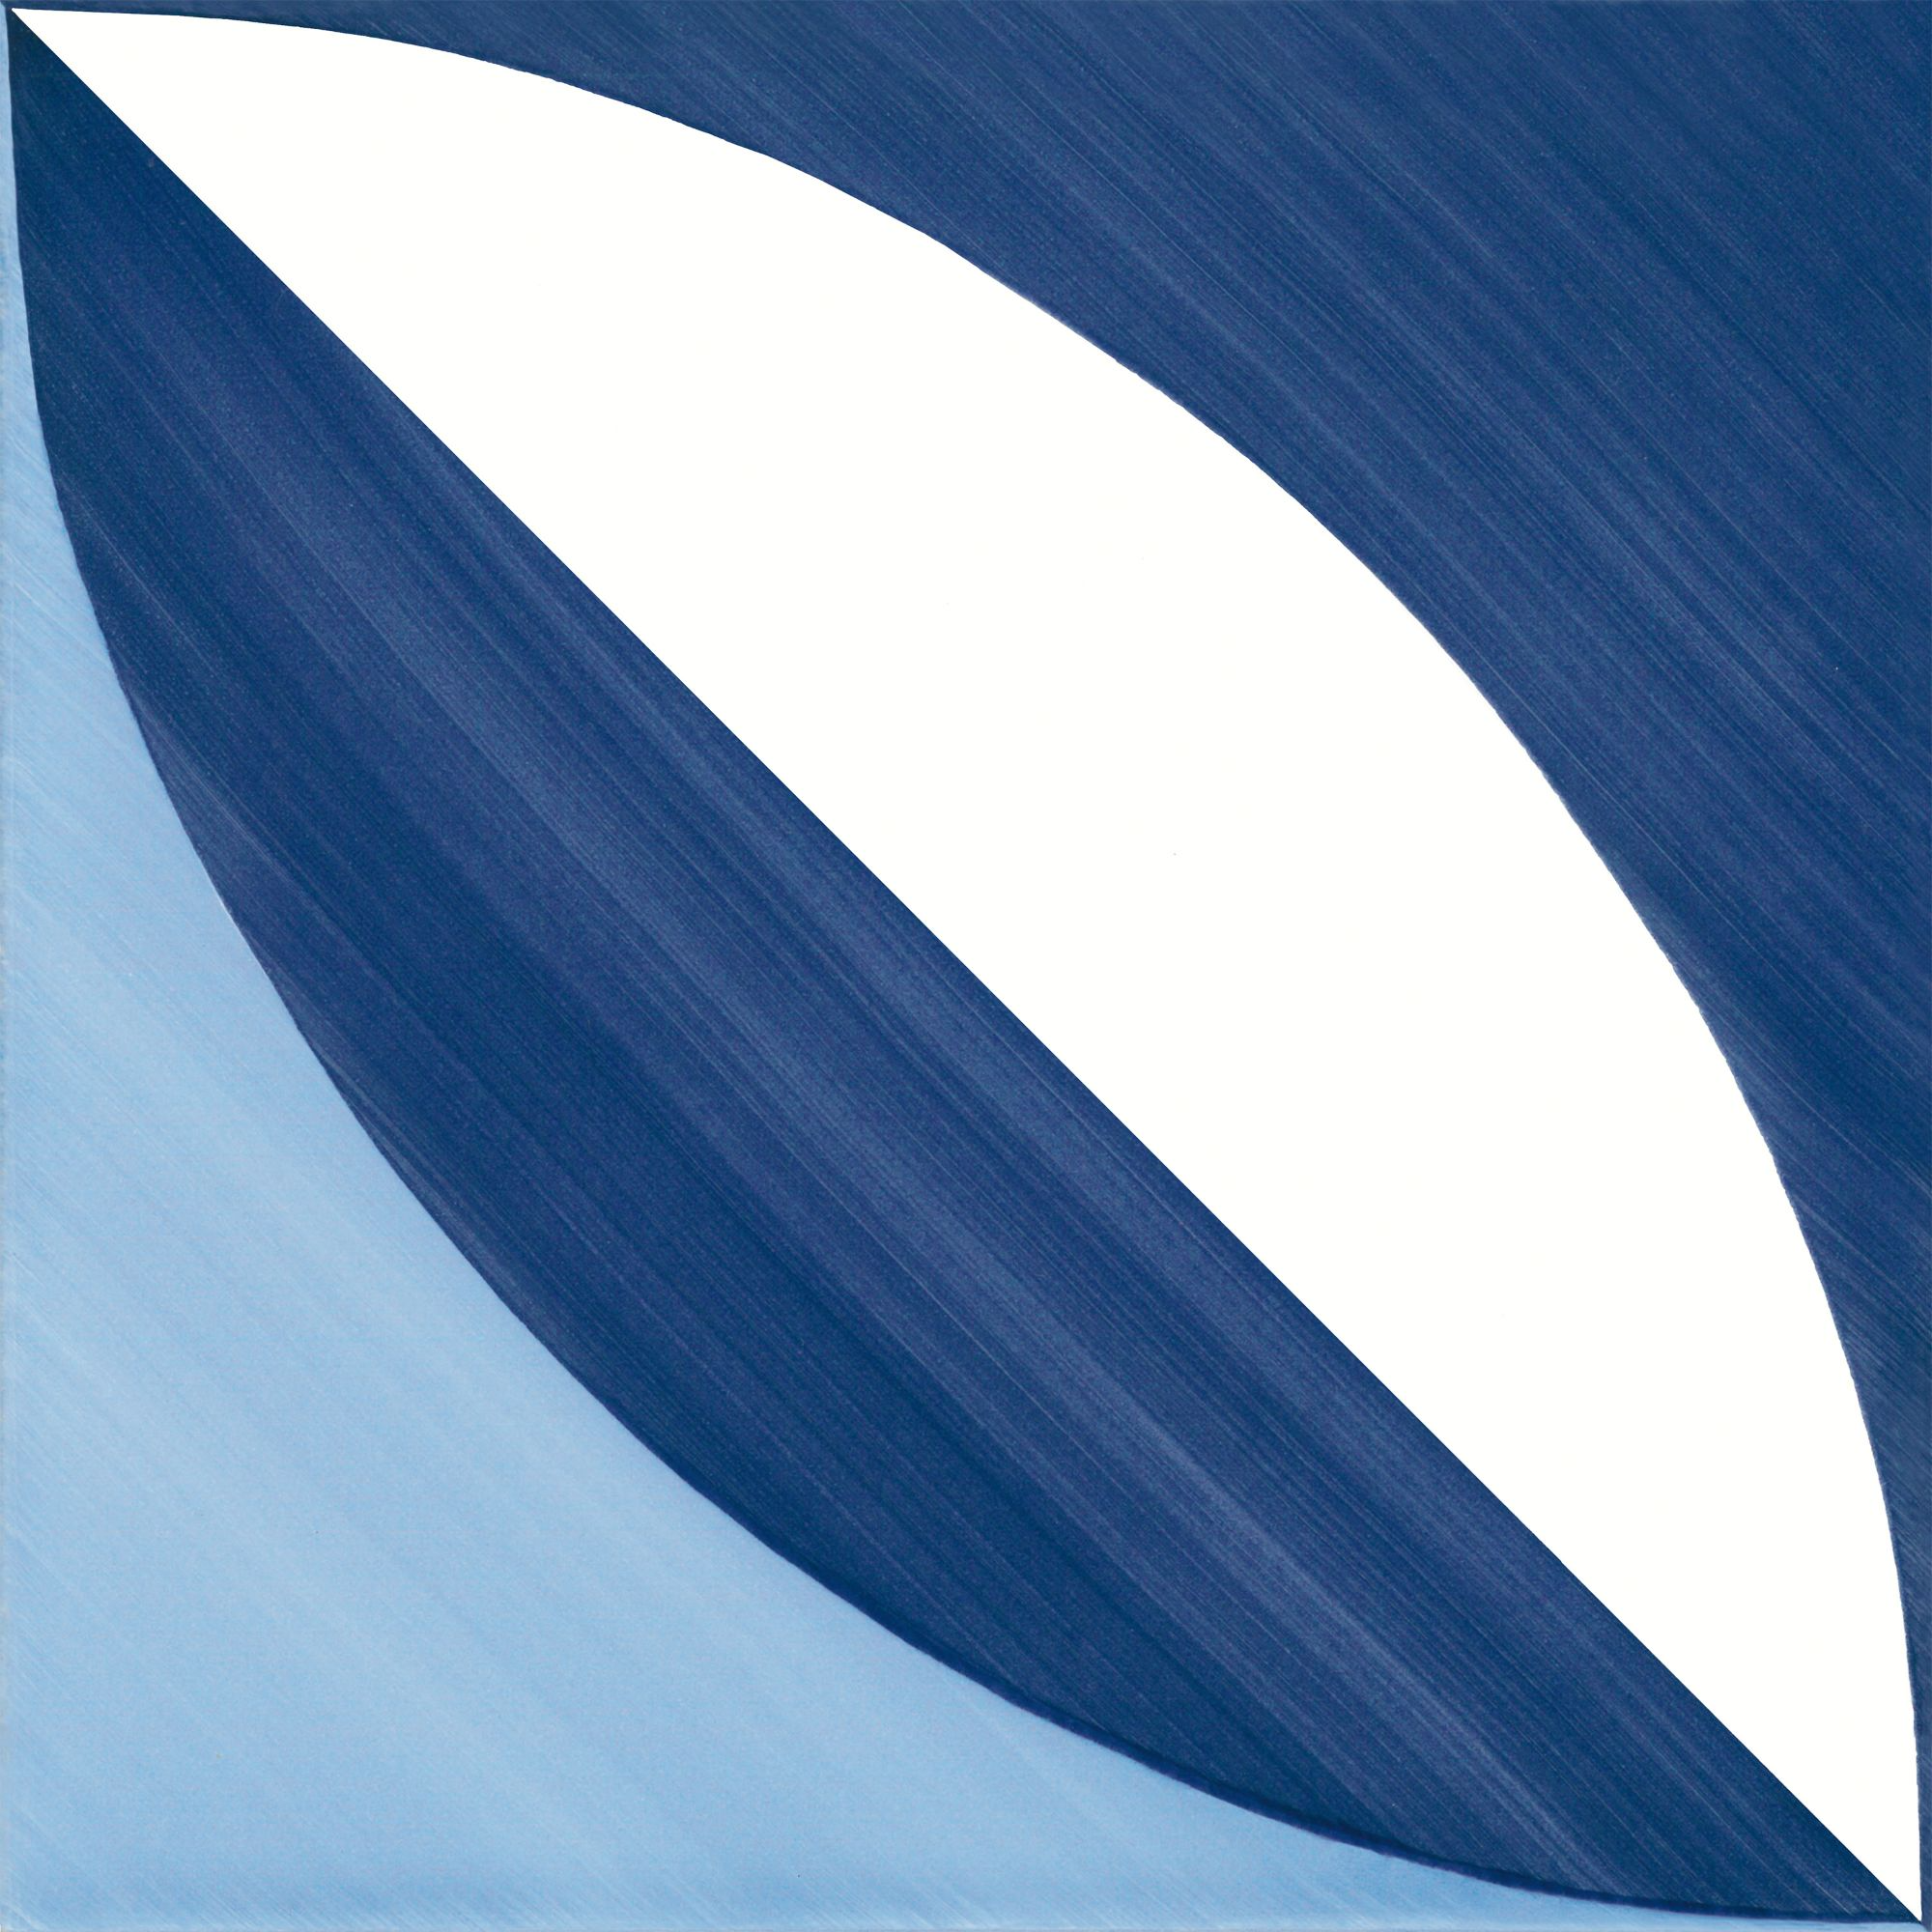 blu-ponti-decoro-tipo-30